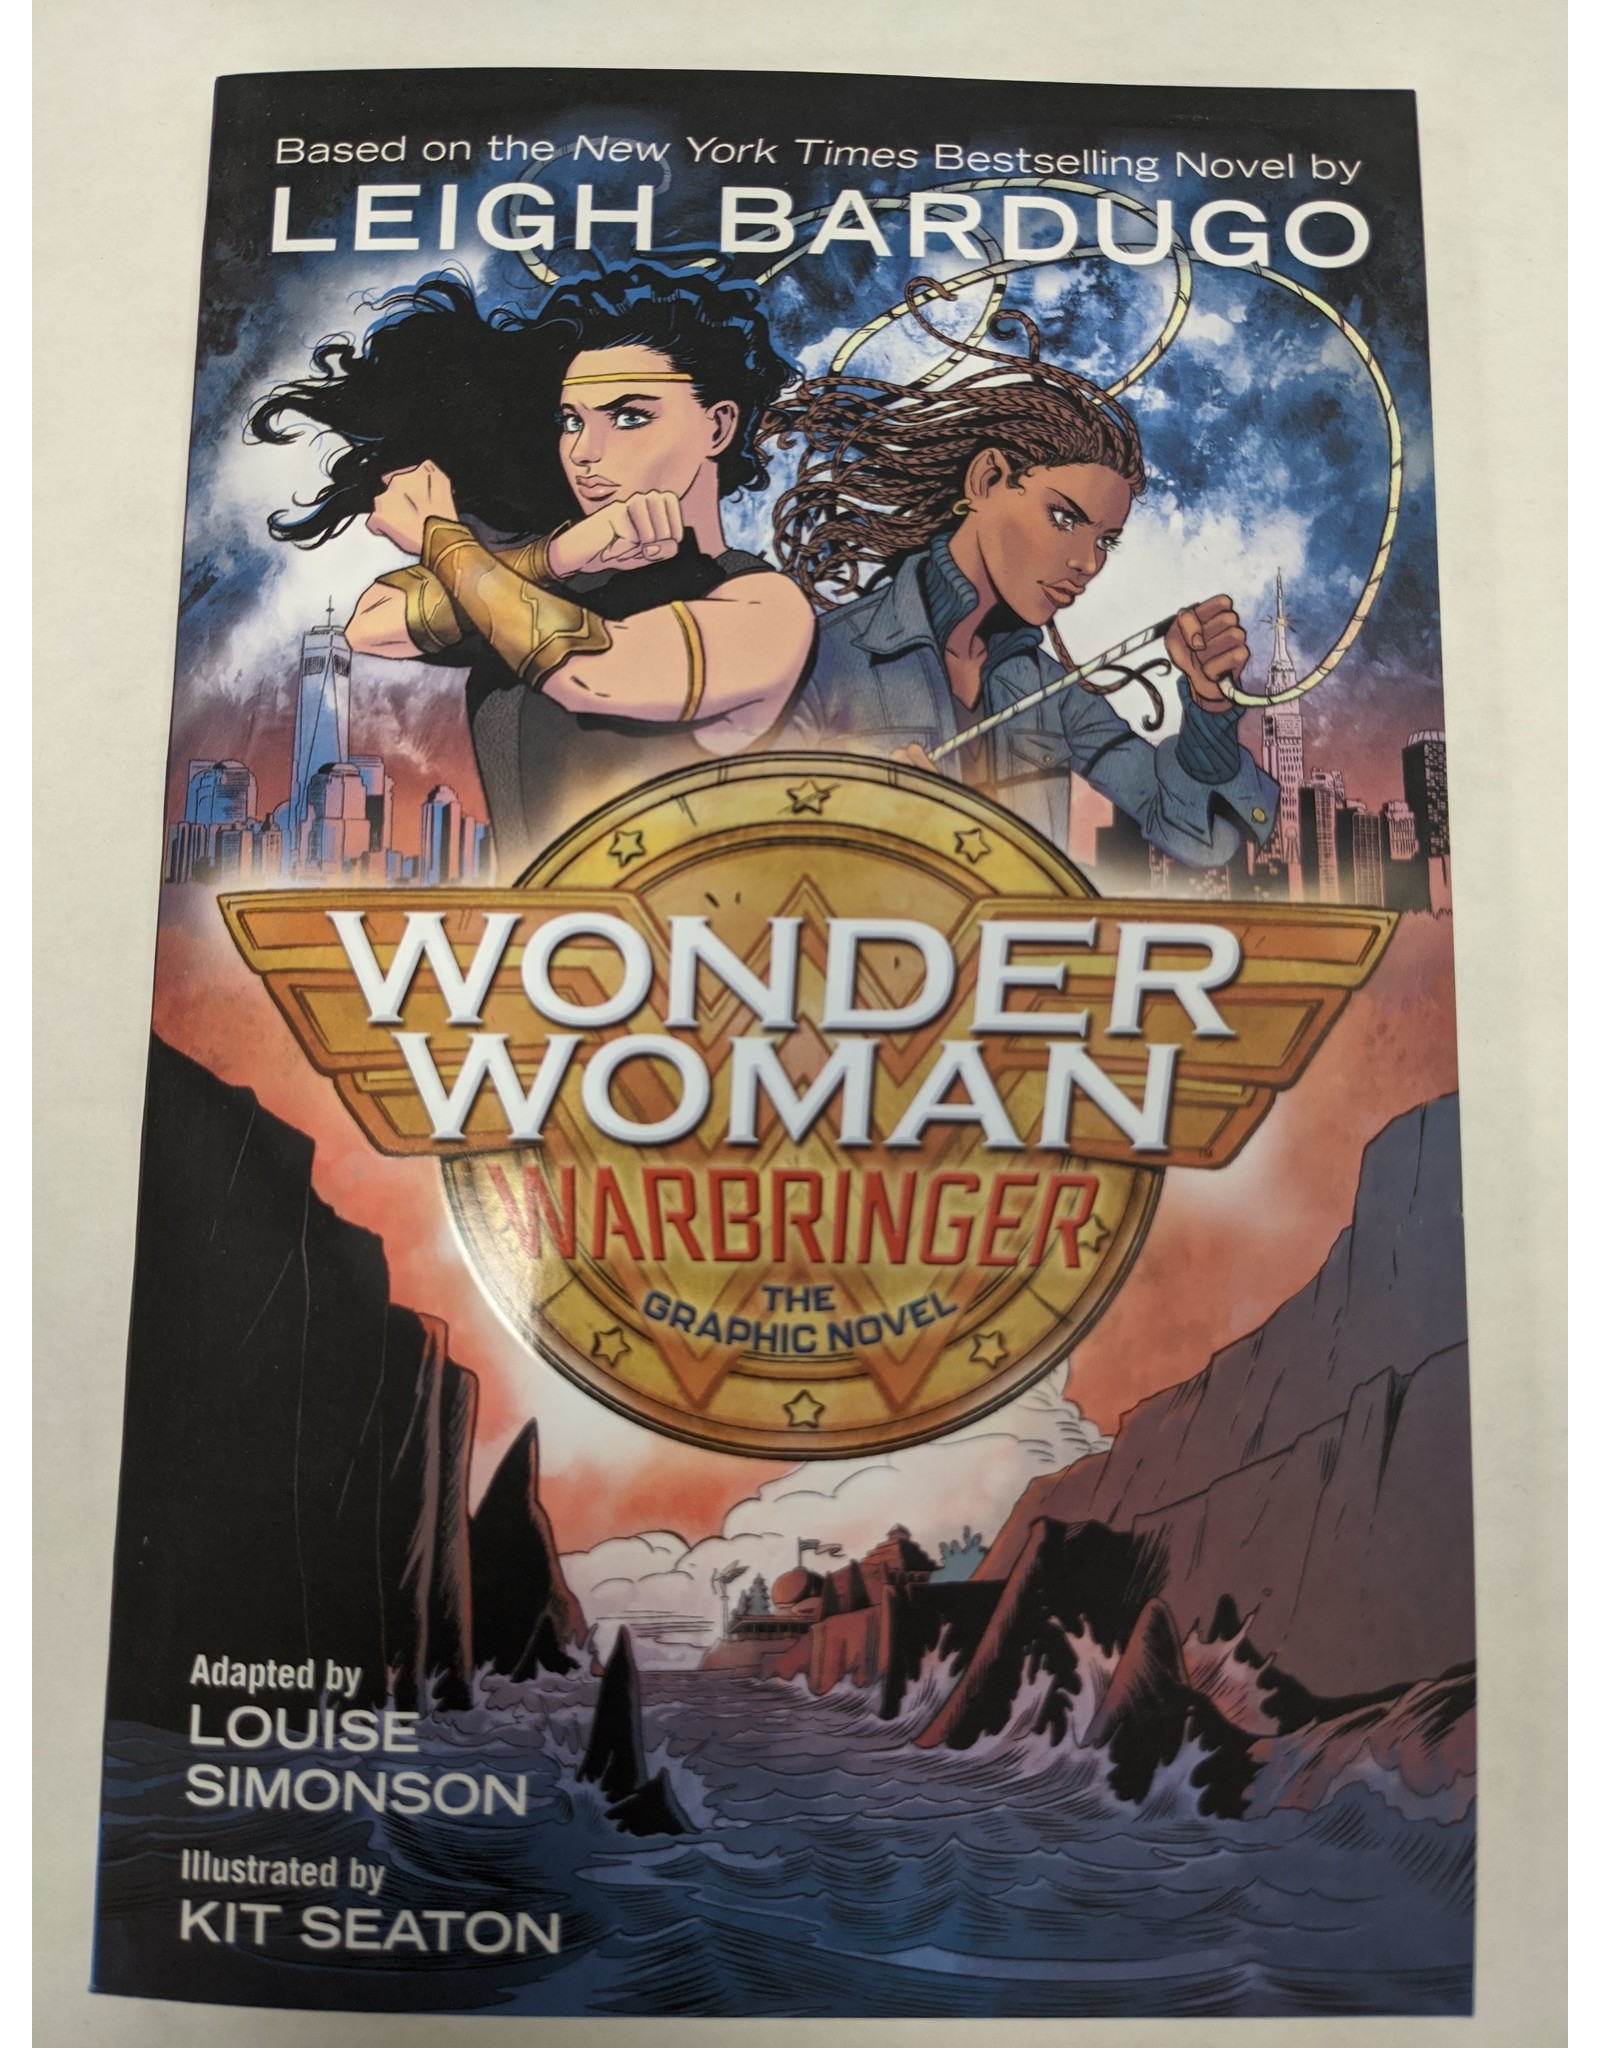 DC COMICS WONDER WOMAN WARBRINGER TP